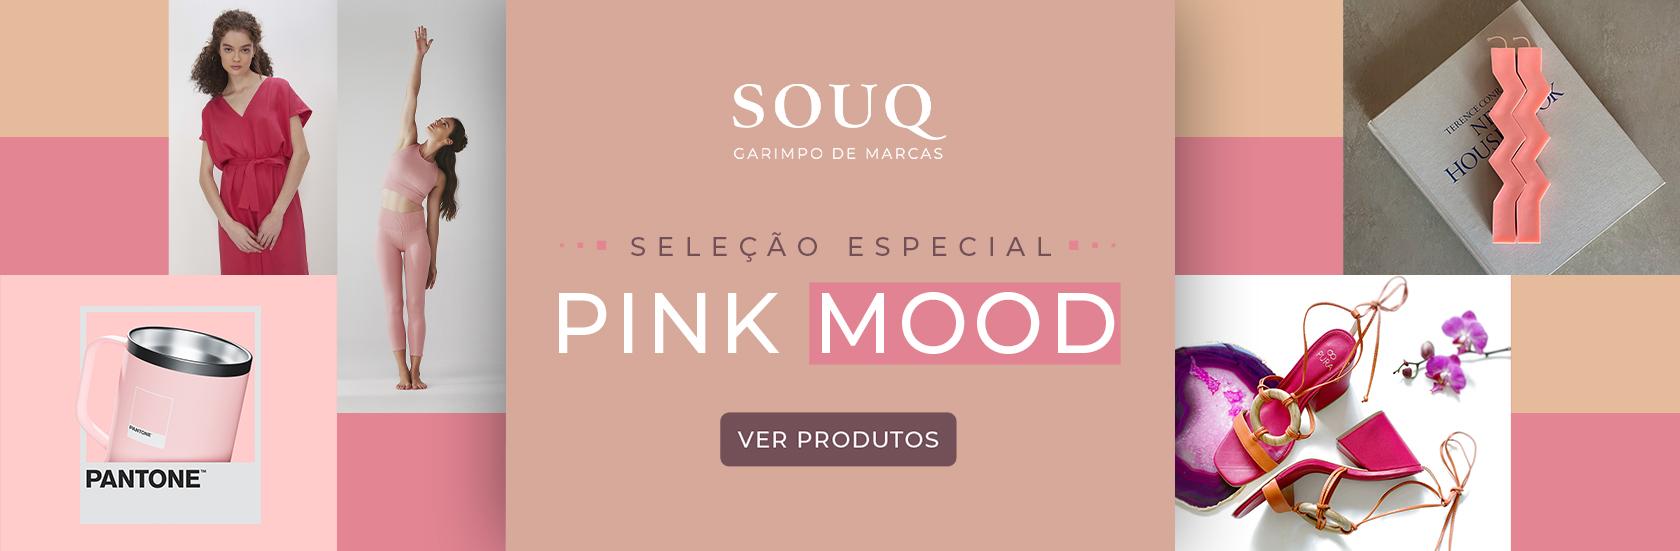 PINK MOOD